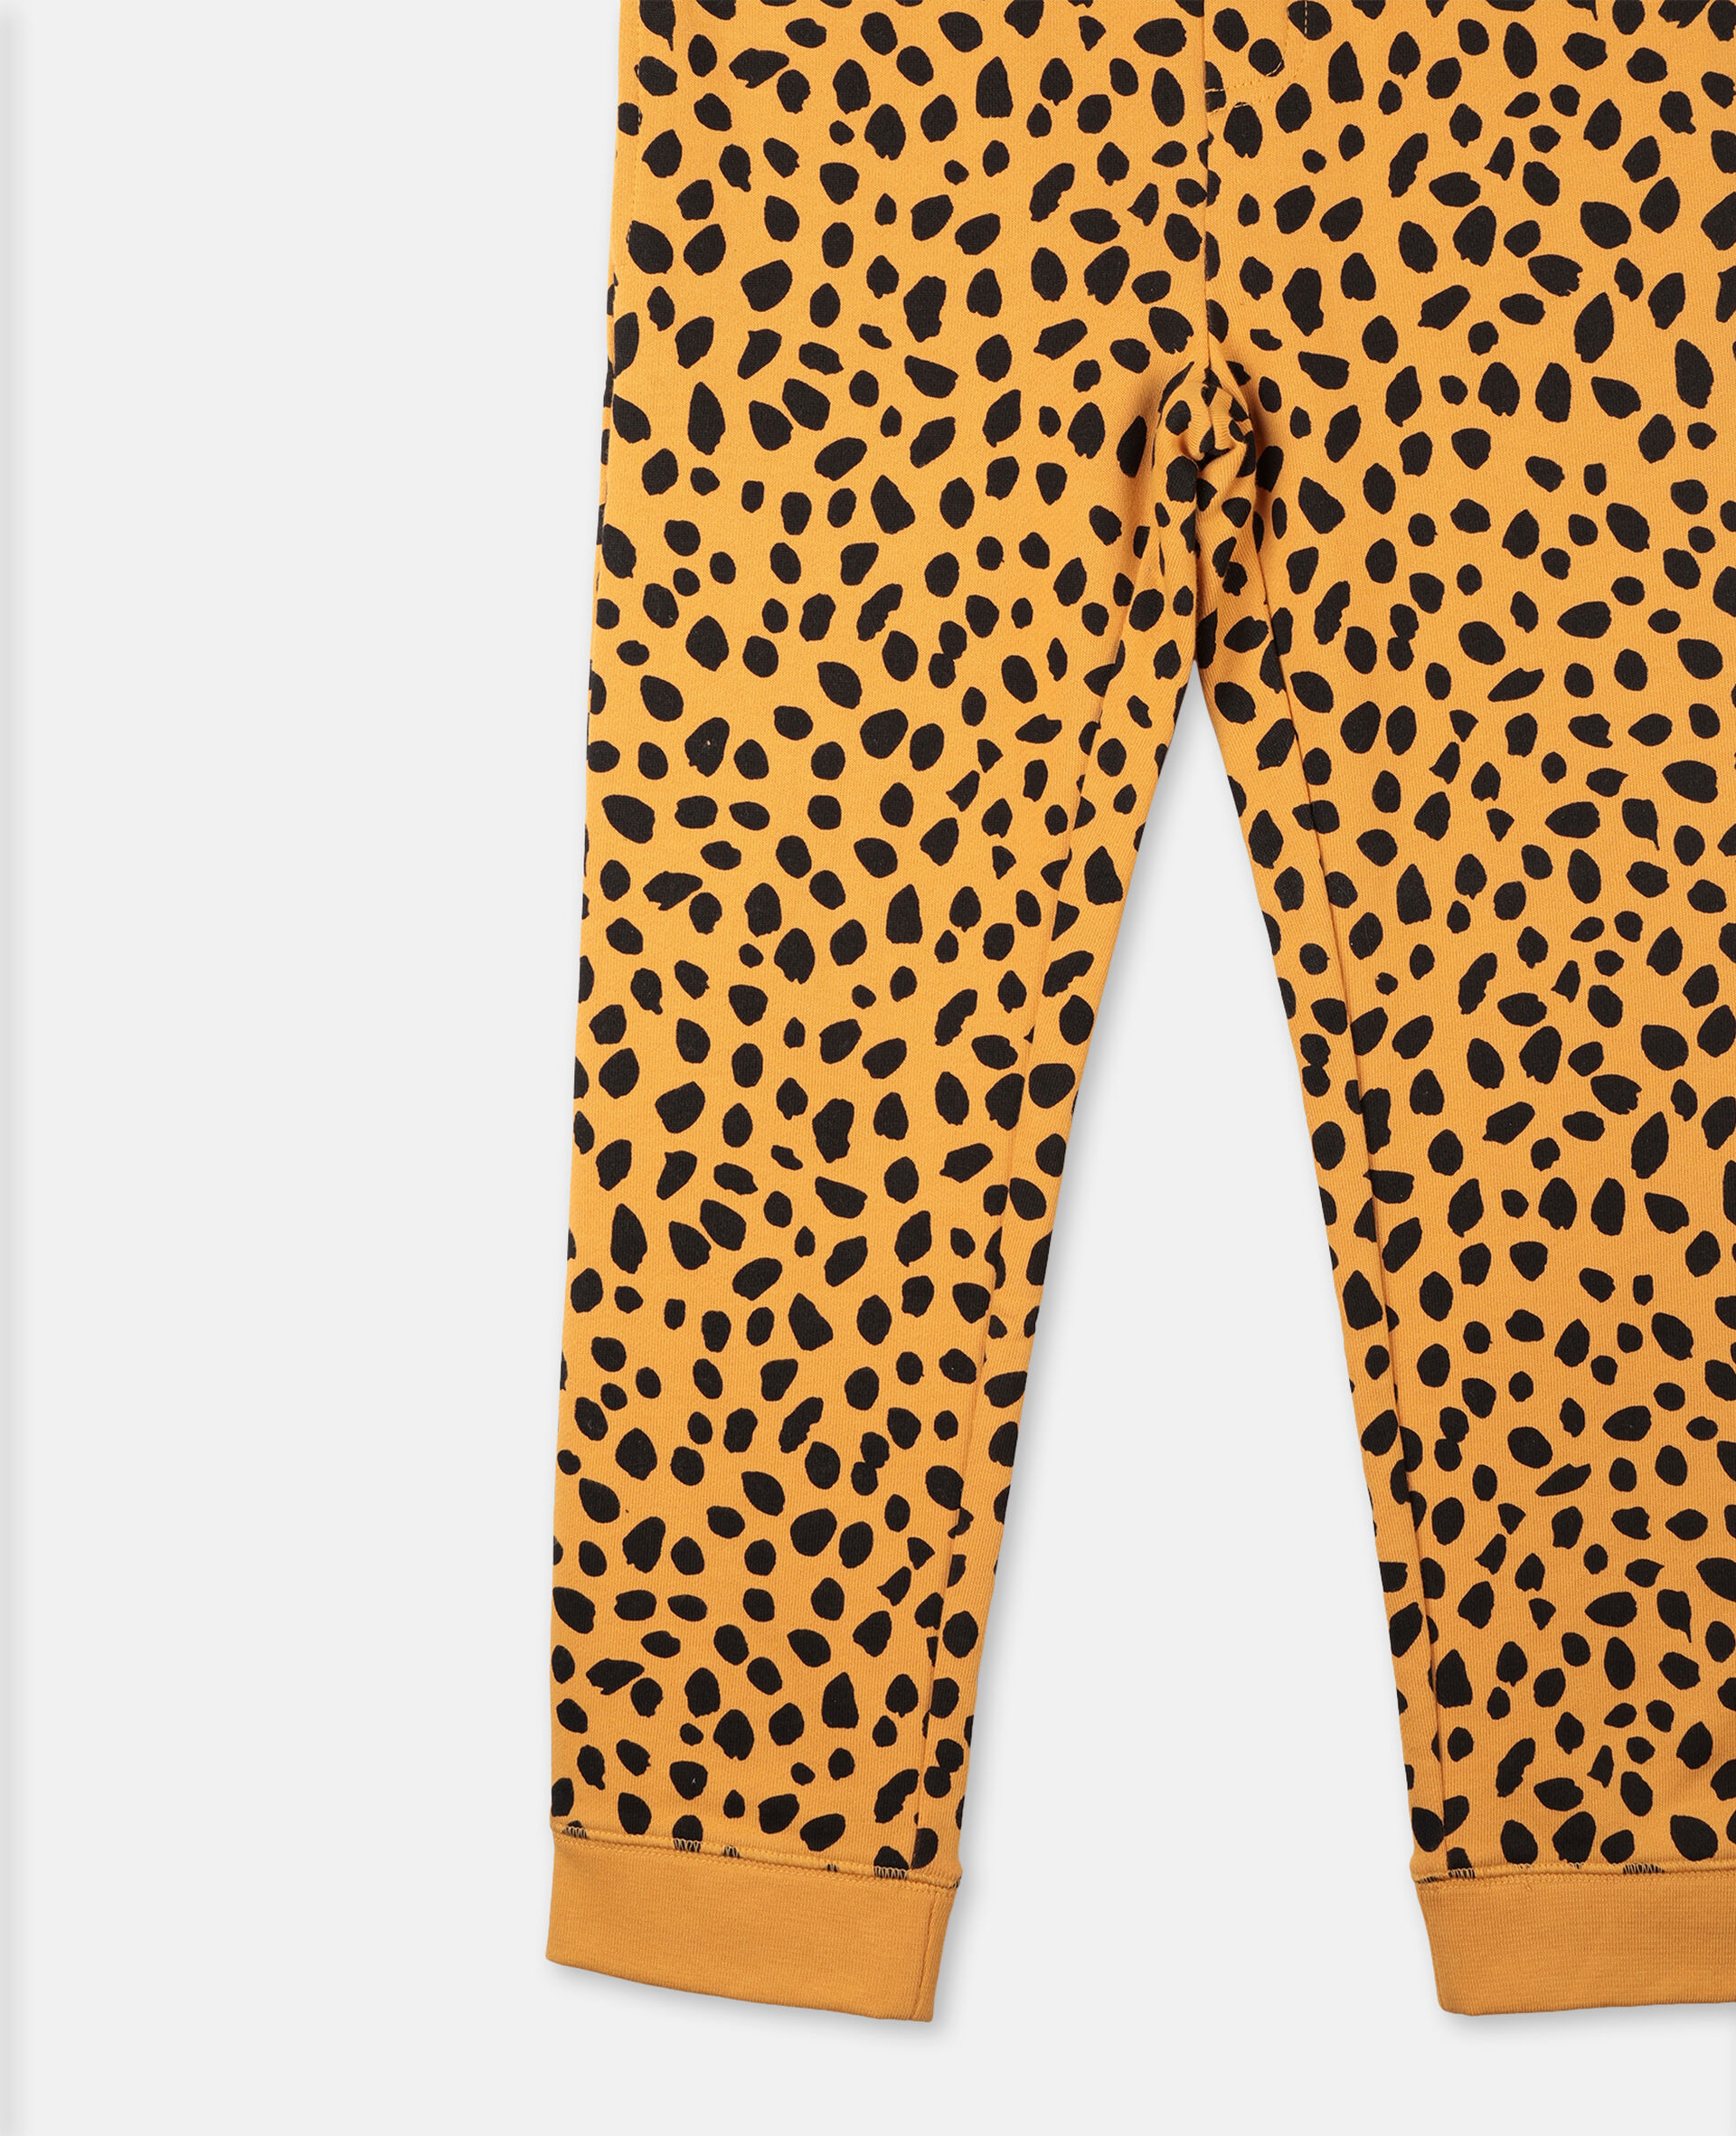 Baumwoll-Jogginghose mit Gepardenpunkte-Print  -Bunt-large image number 1